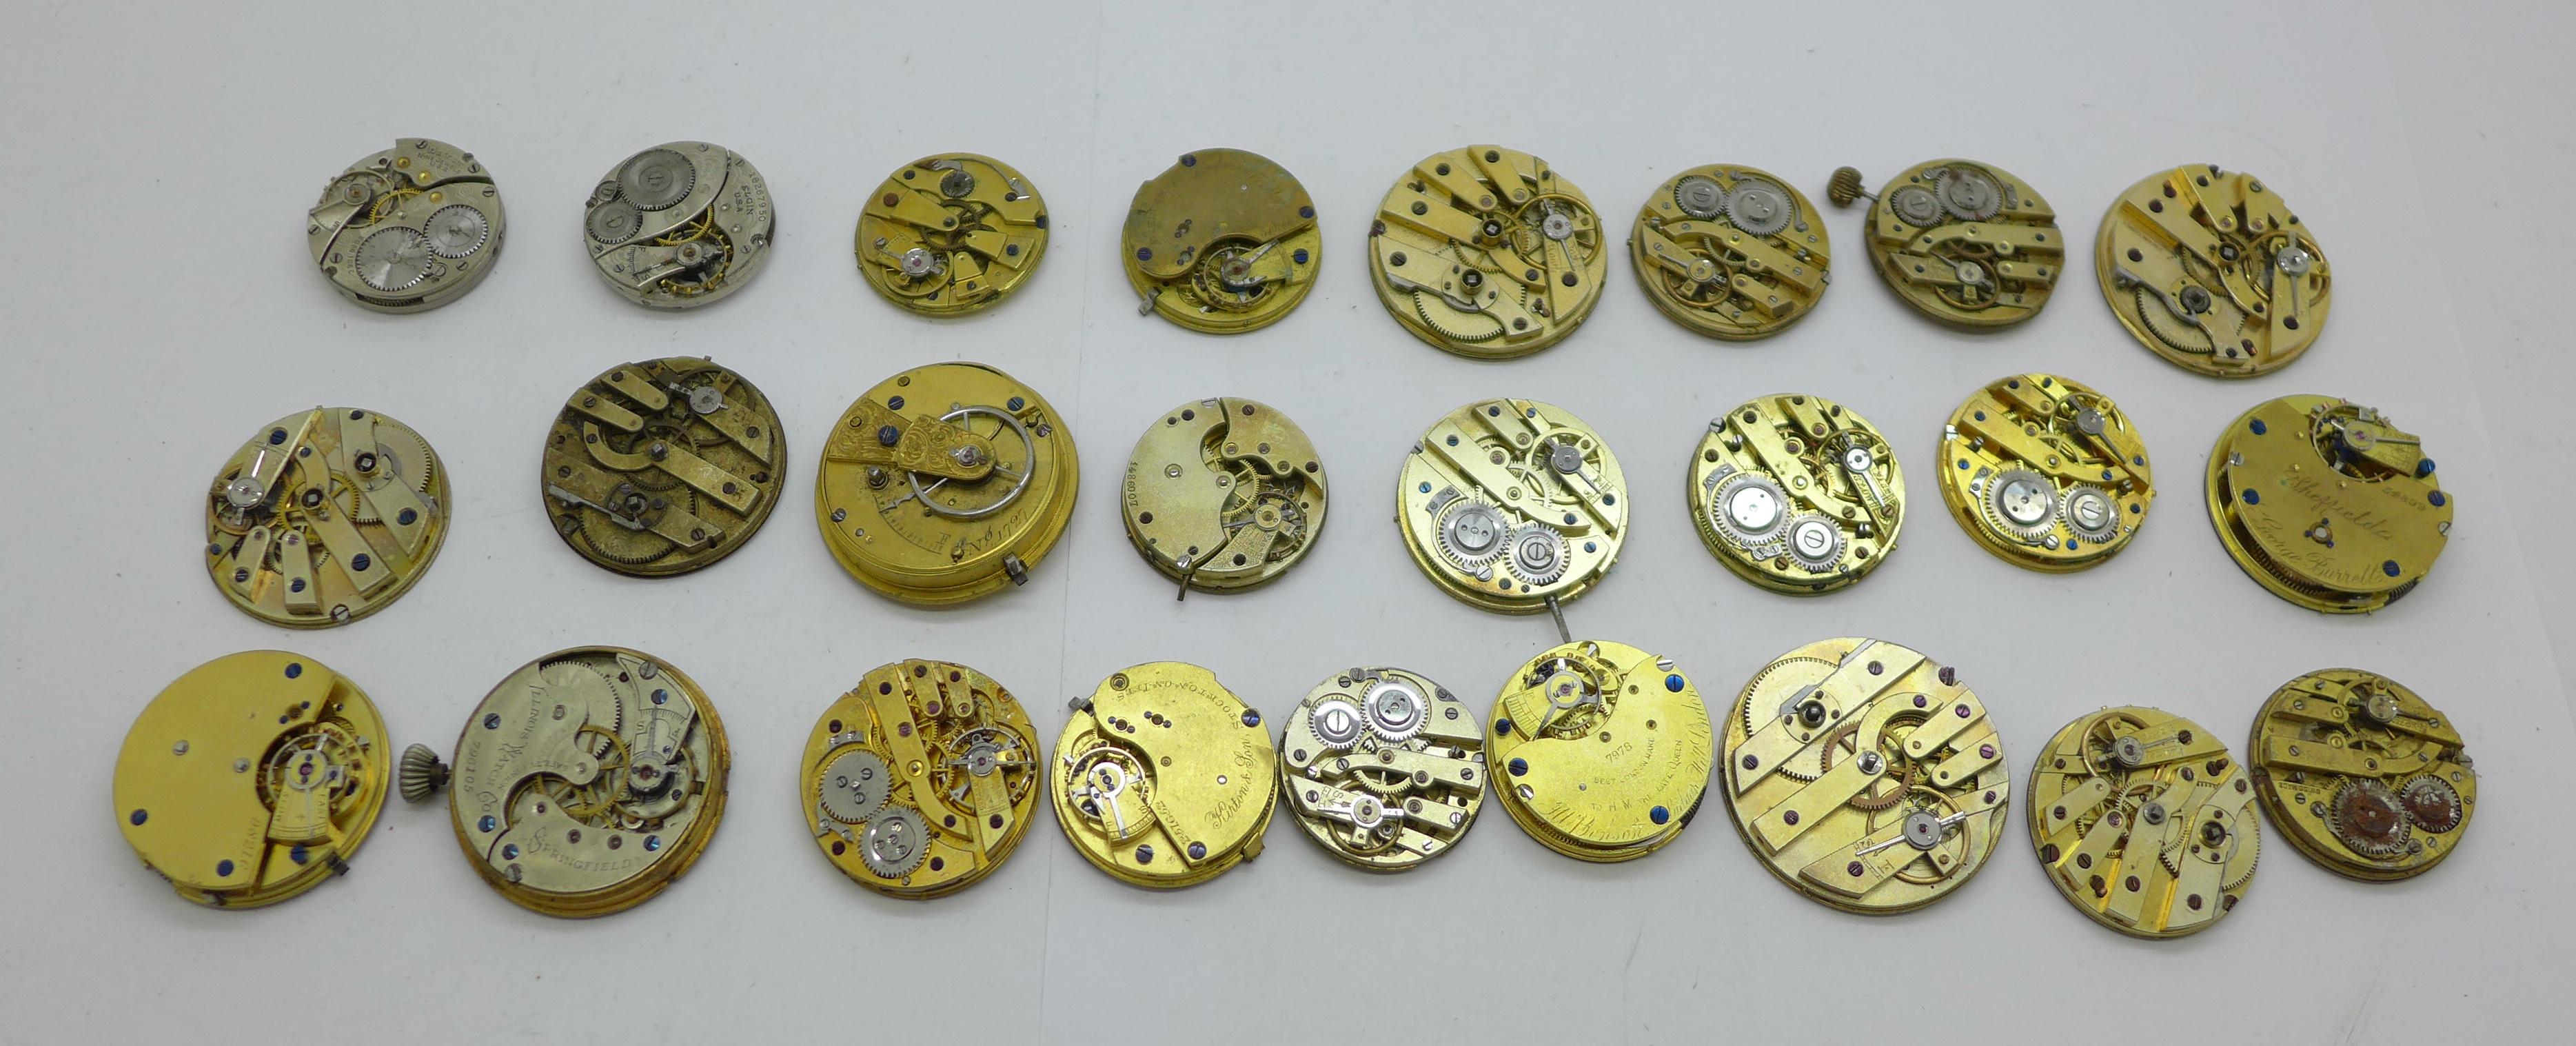 Twenty-five wristwatch, fob and pocket watch movements, Elgin, JW Benson, Waltham, etc. - Image 4 of 4